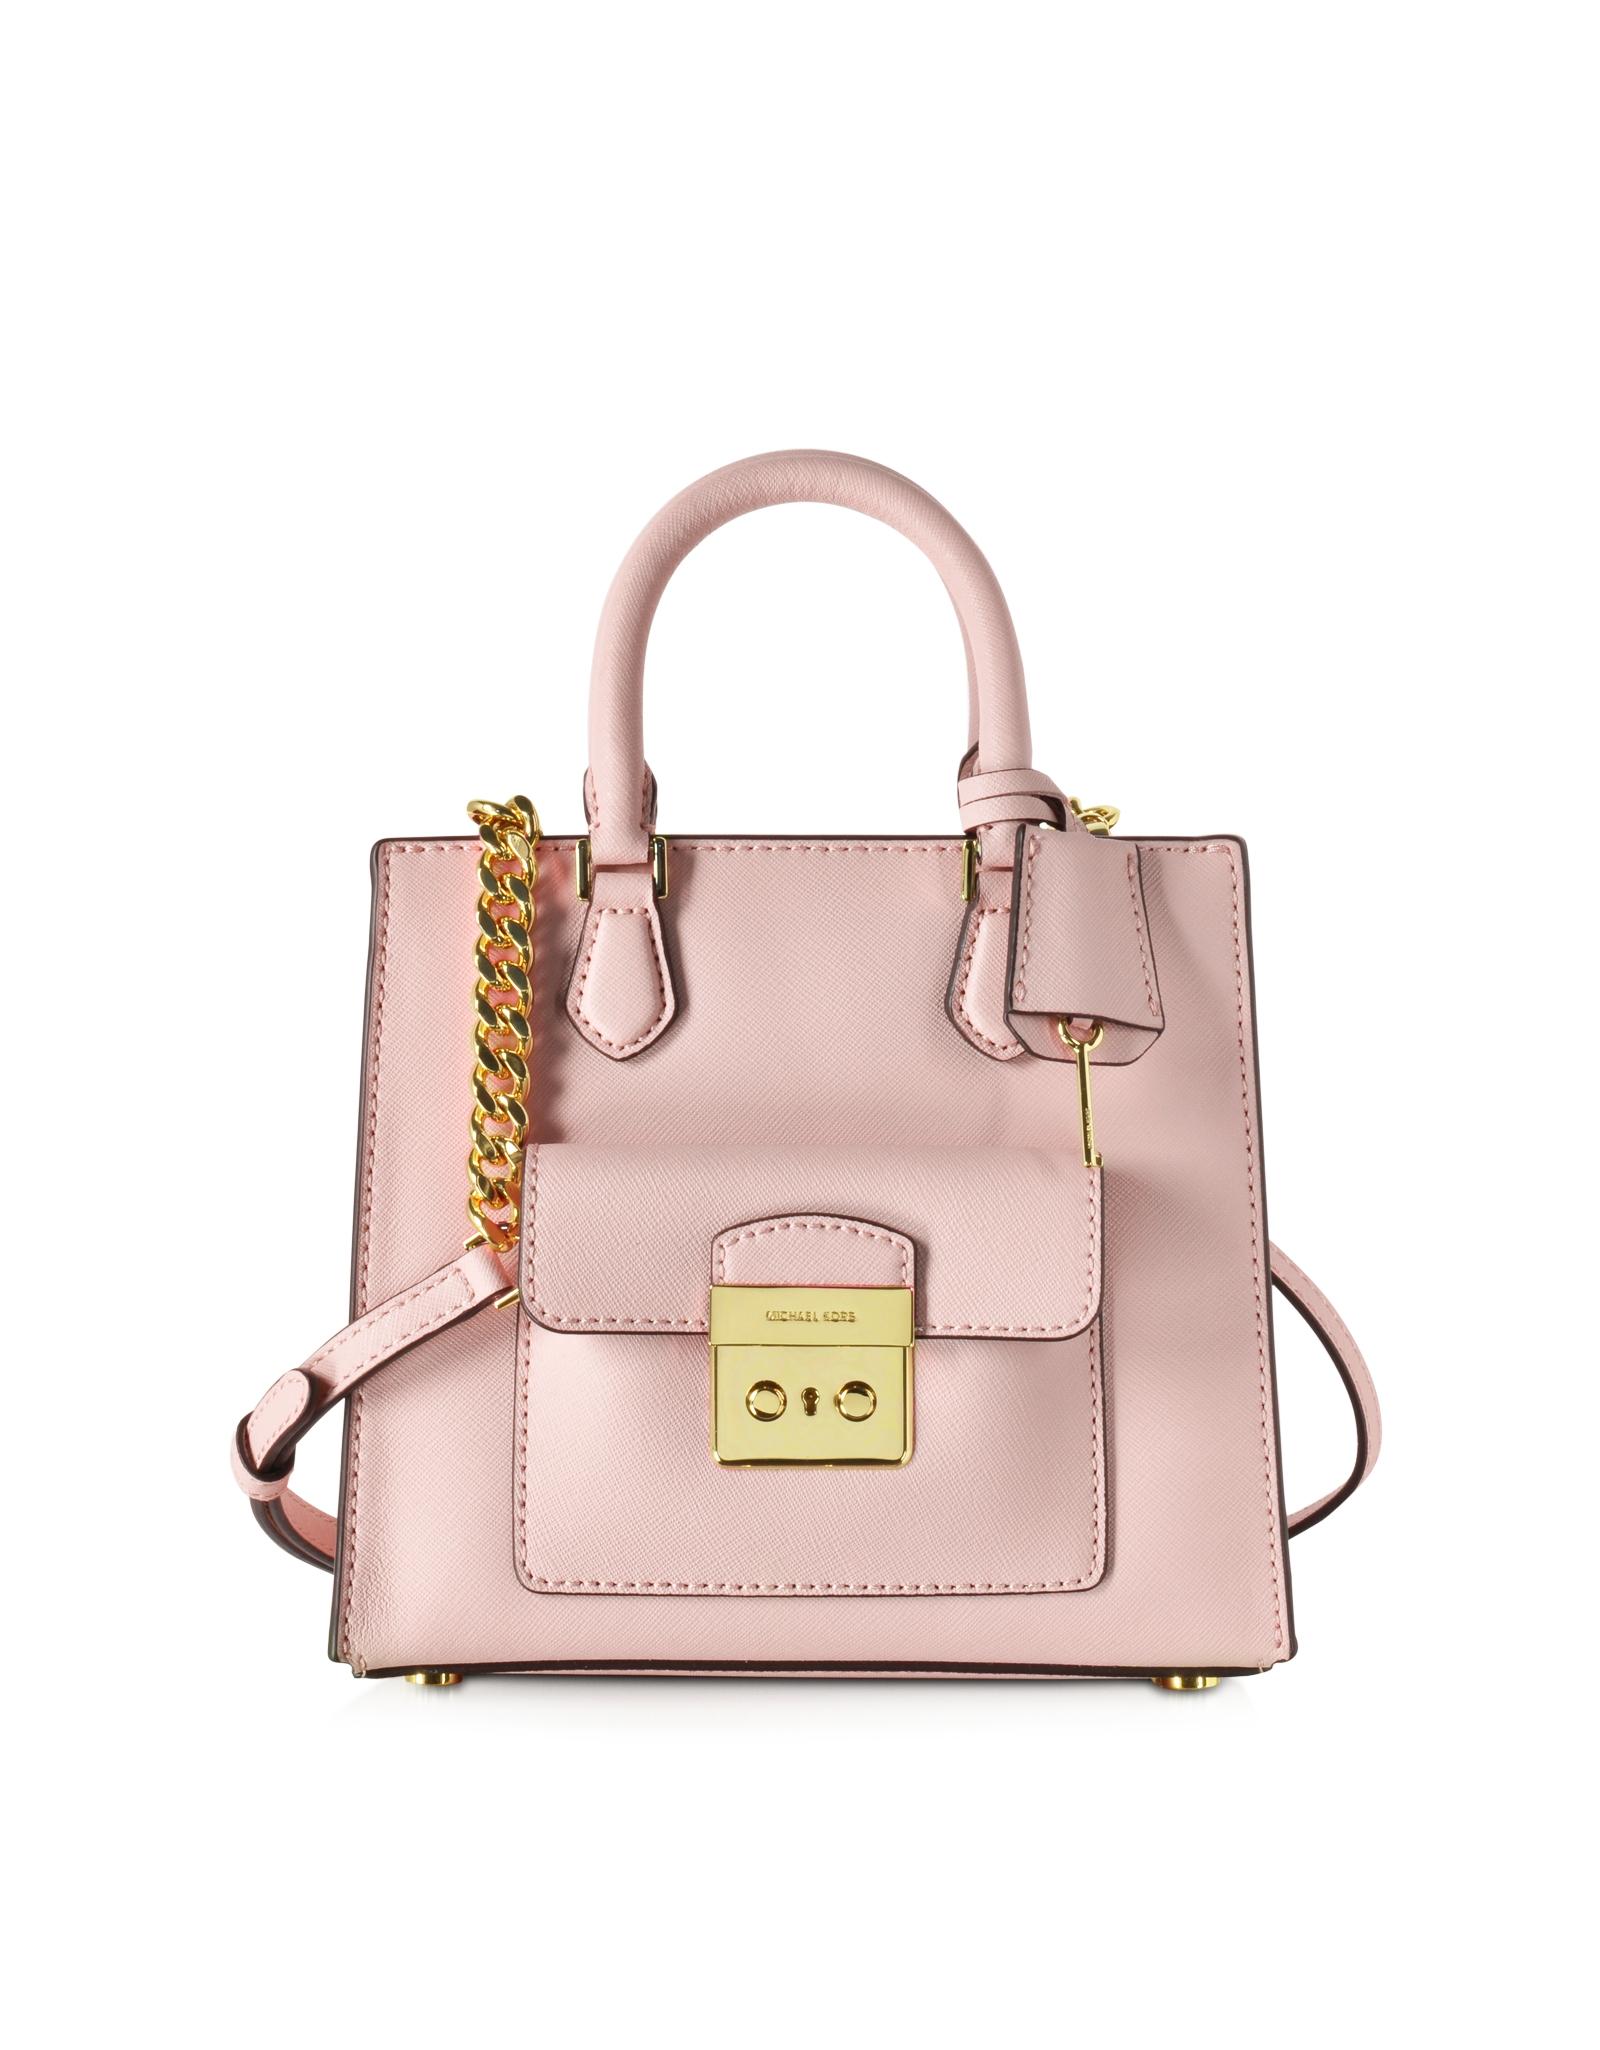 0ca83f0800a6 Michael Kors Bridgette Blossom Pink Saffiano Leather Small Ns ...